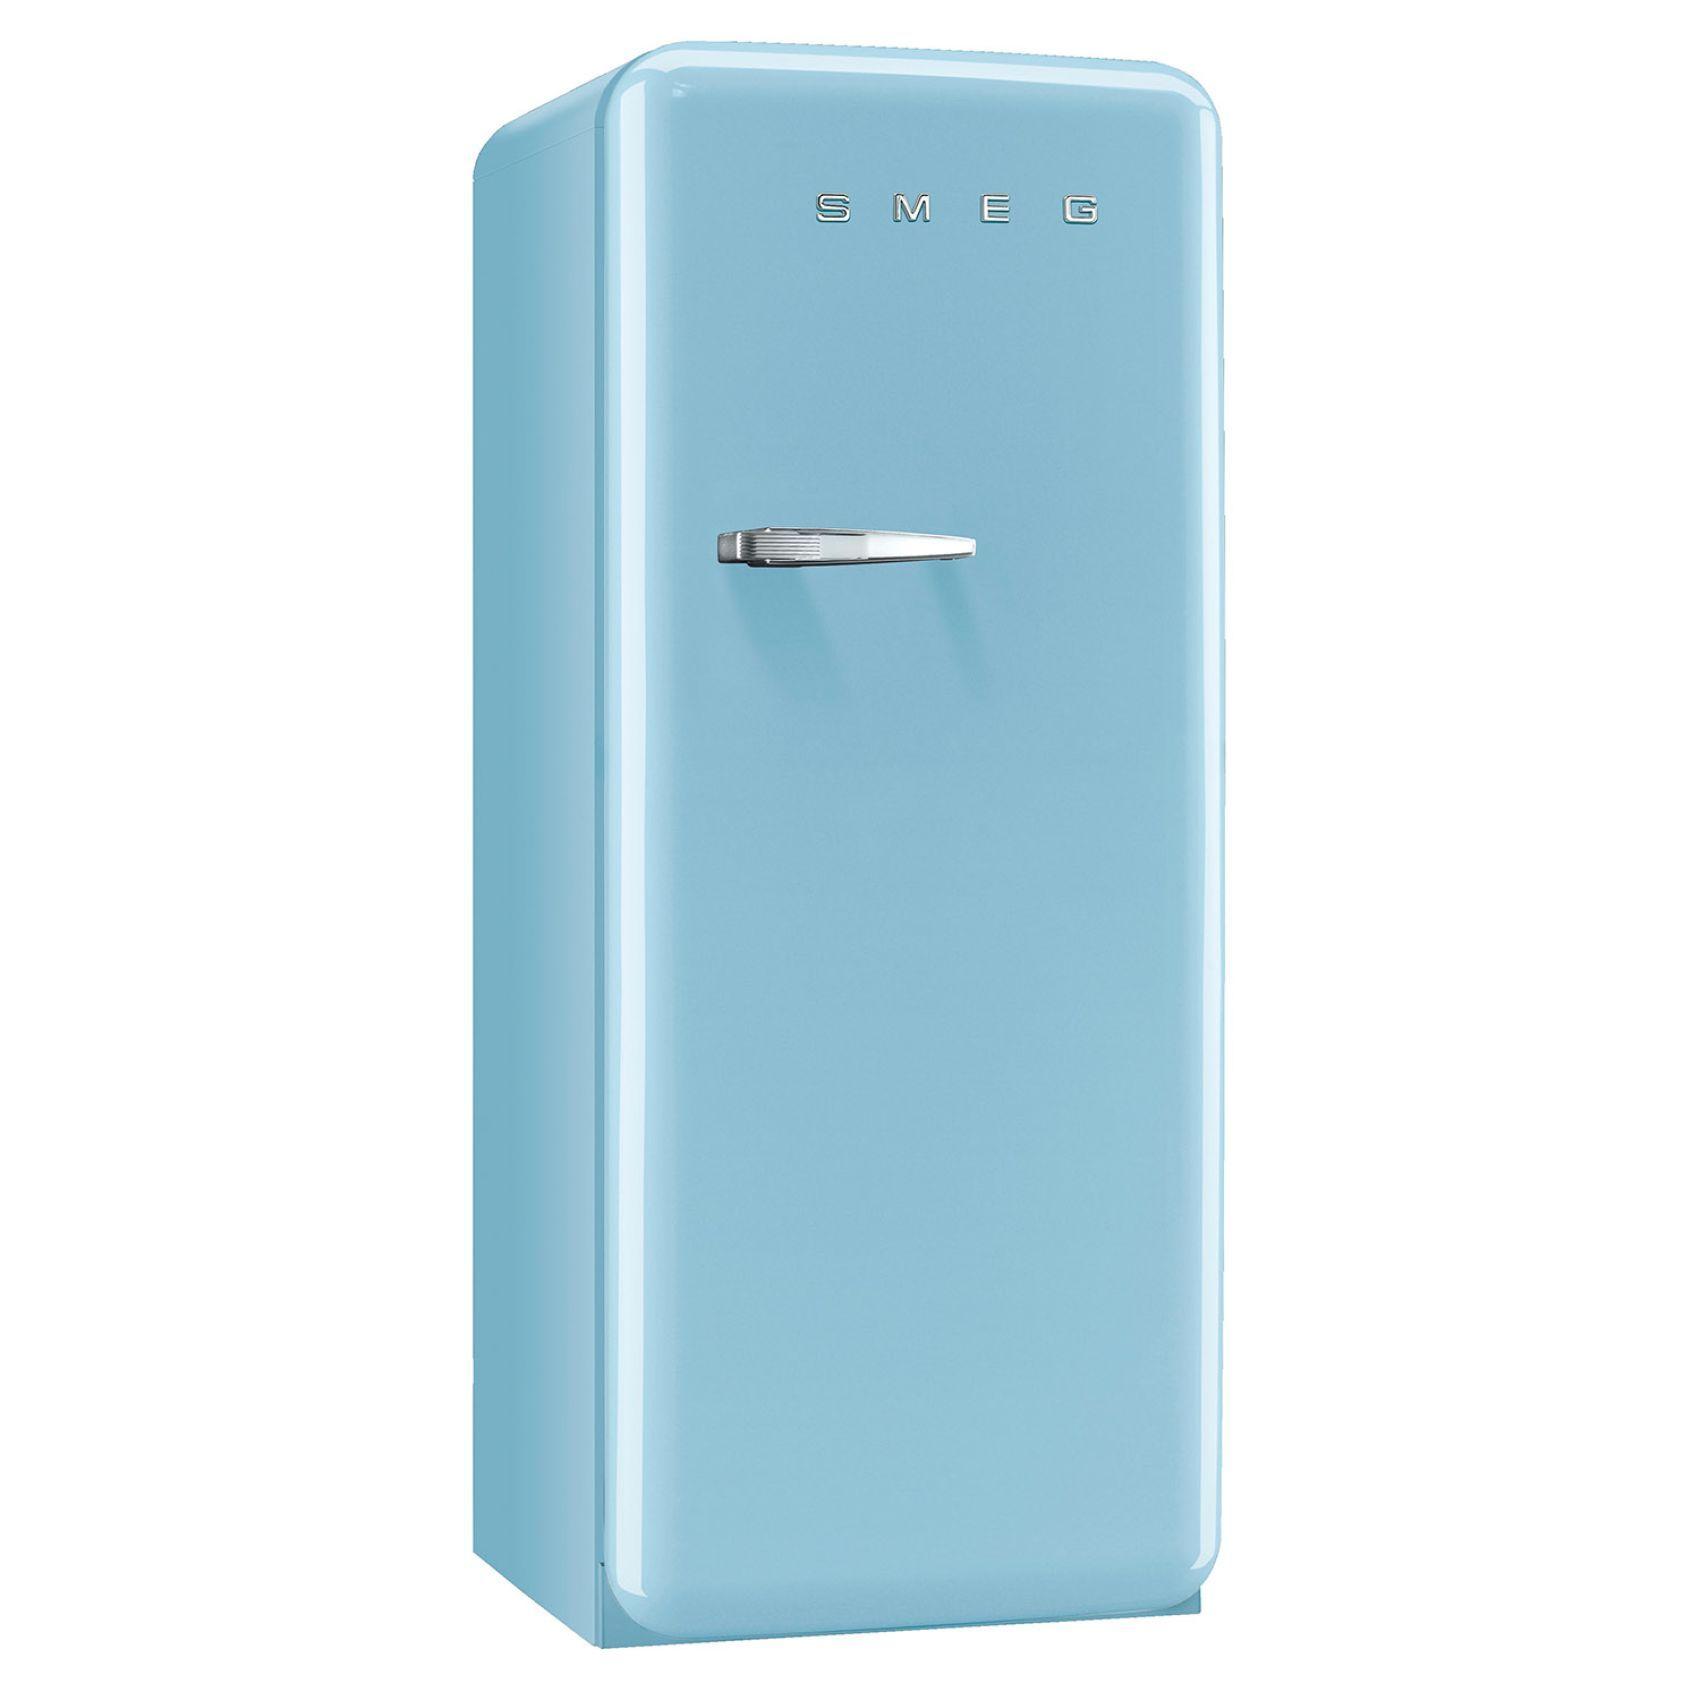 Smeg Single Door Refrigerator With Freezer Compartment Right Hand Hinge Single Door Design Single Doors Smeg